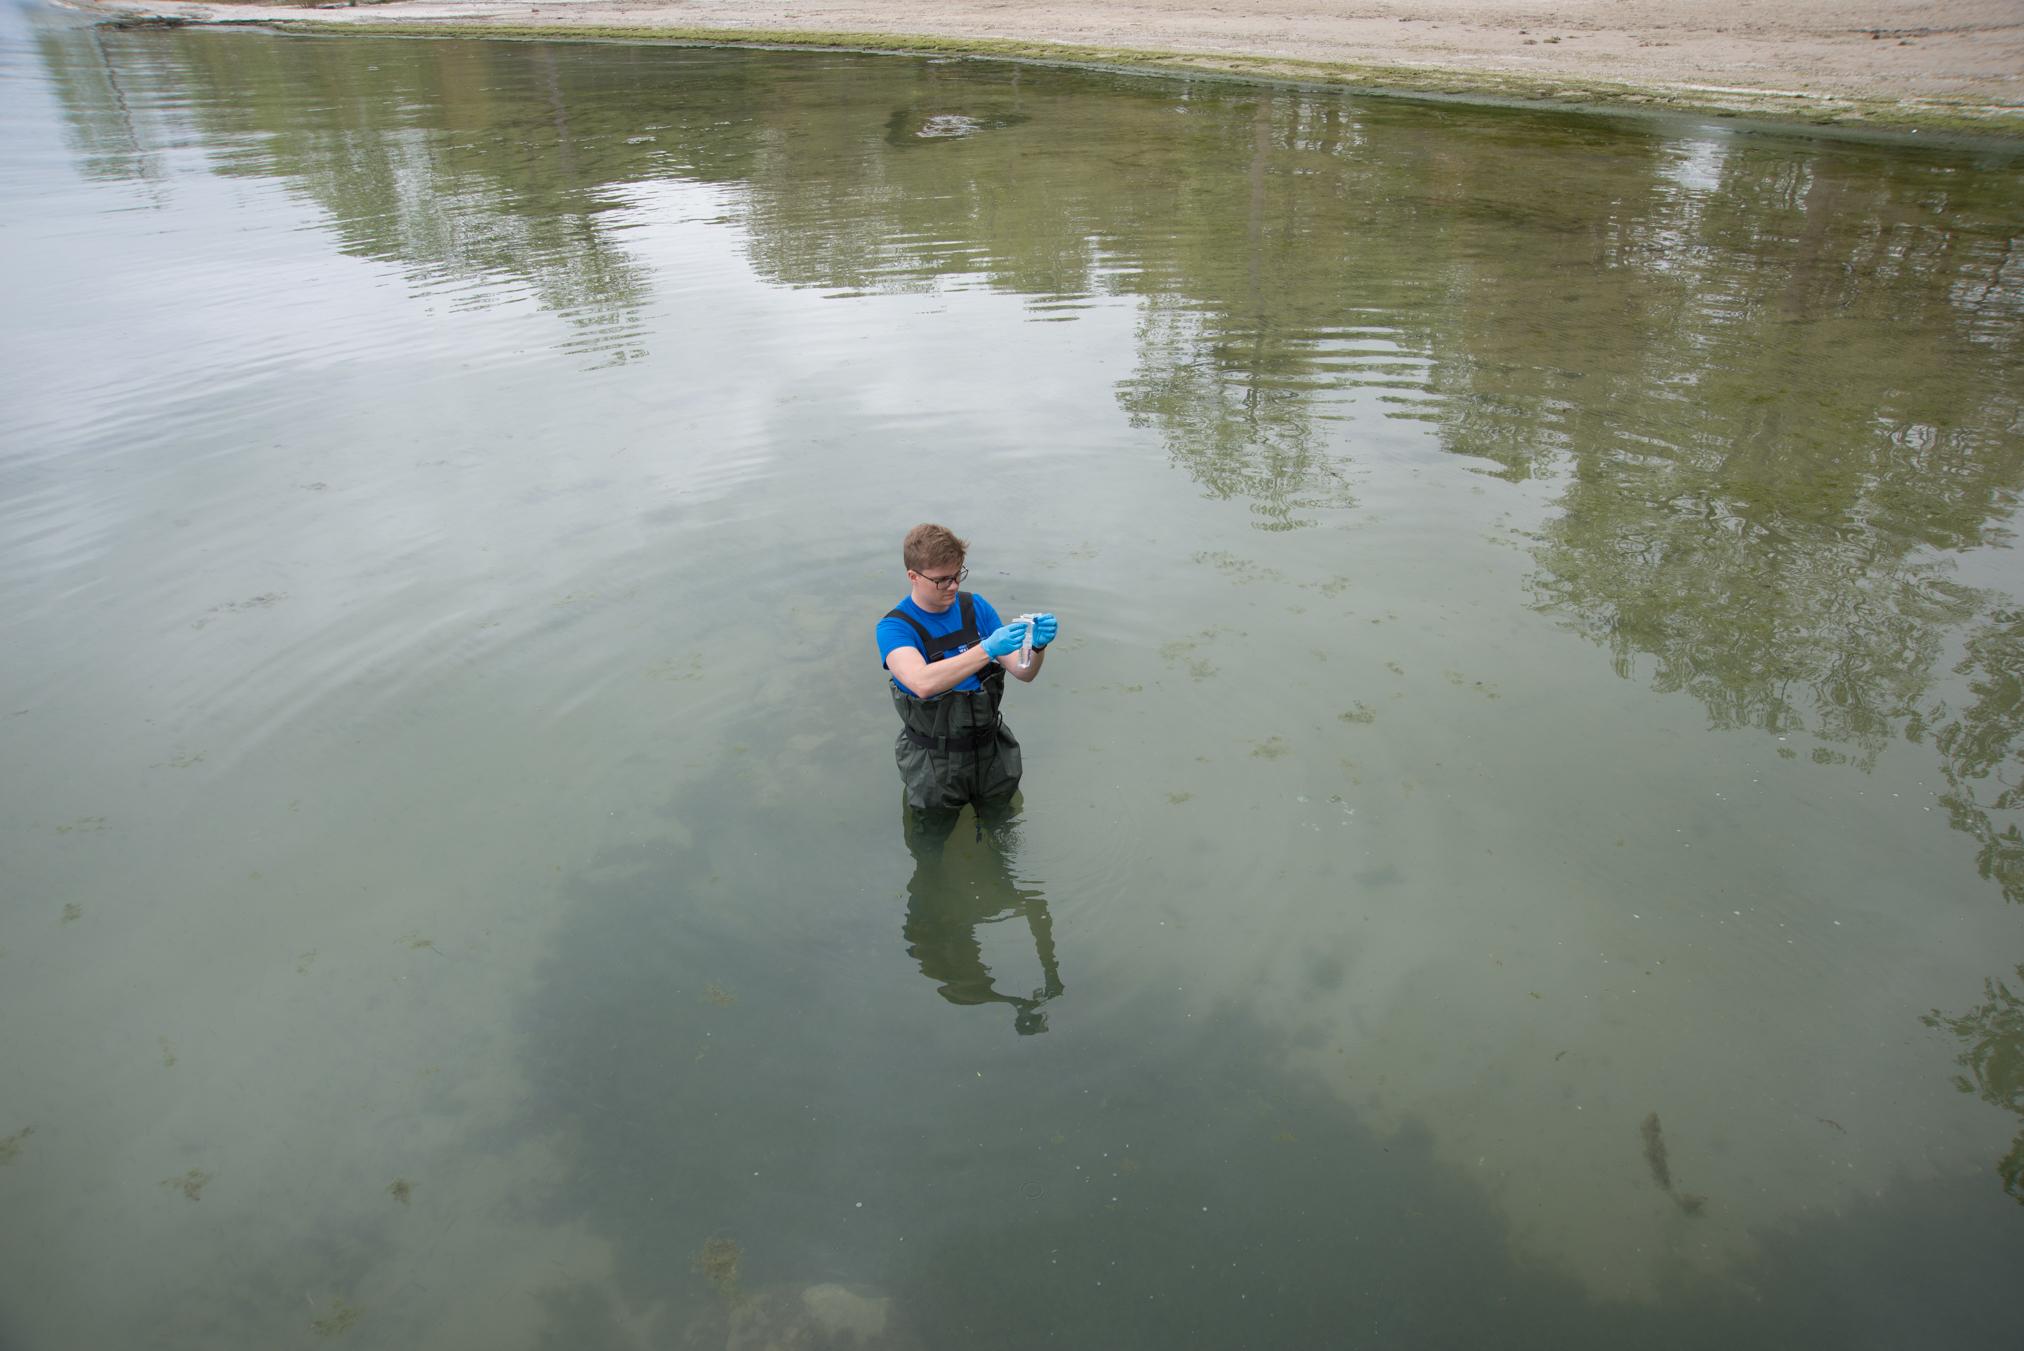 Swim Drink Fish staff monitoring in Fort Erie on Lake Erie. Image Credit: Swim Drink Fish.